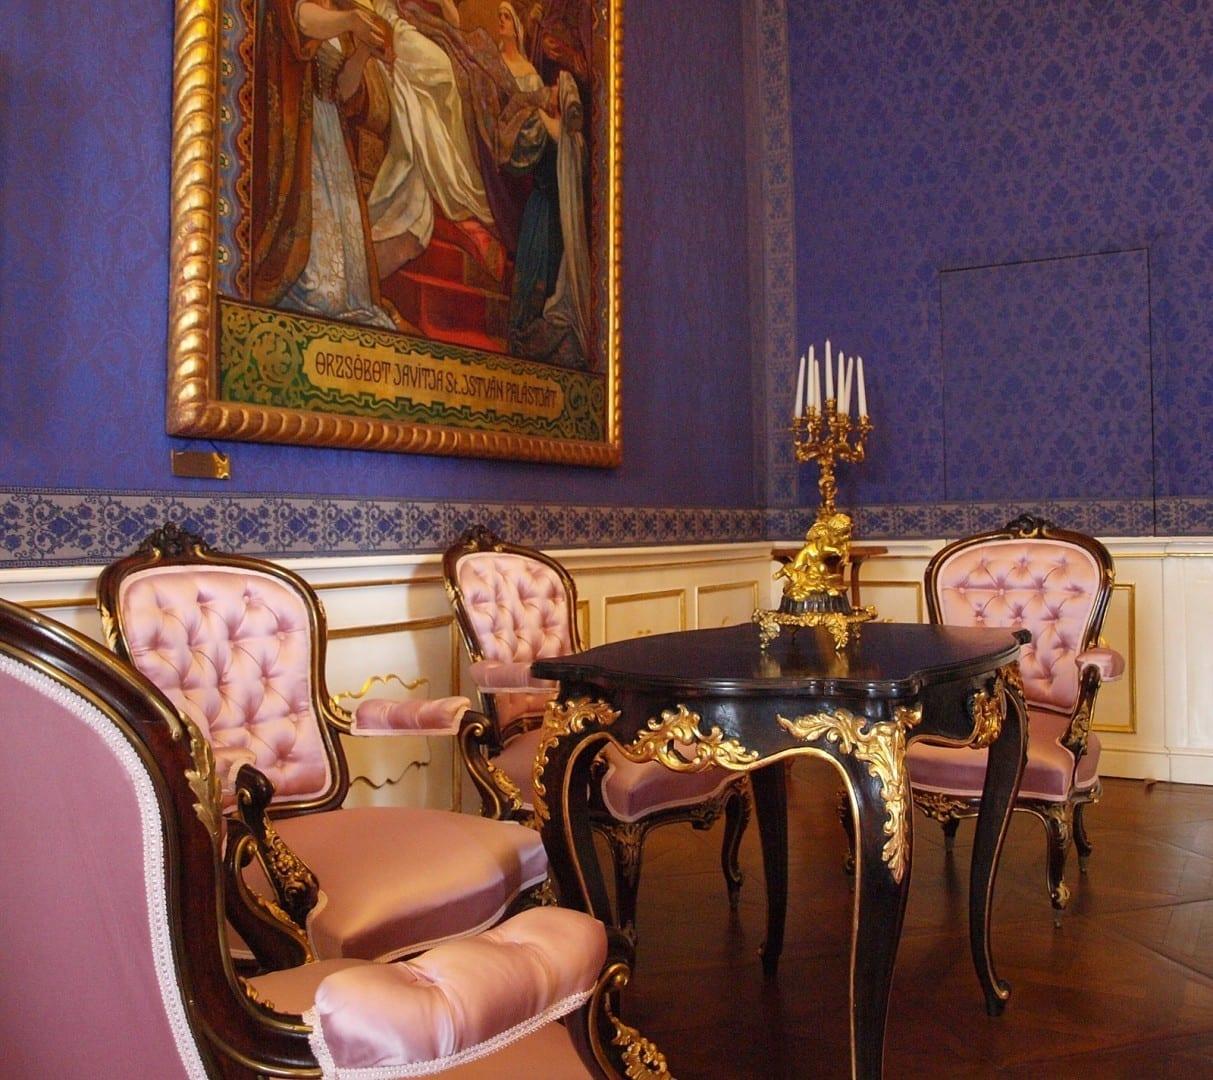 Palacio Real de Gödöllő, Suites Reales Gödöllő Hungría